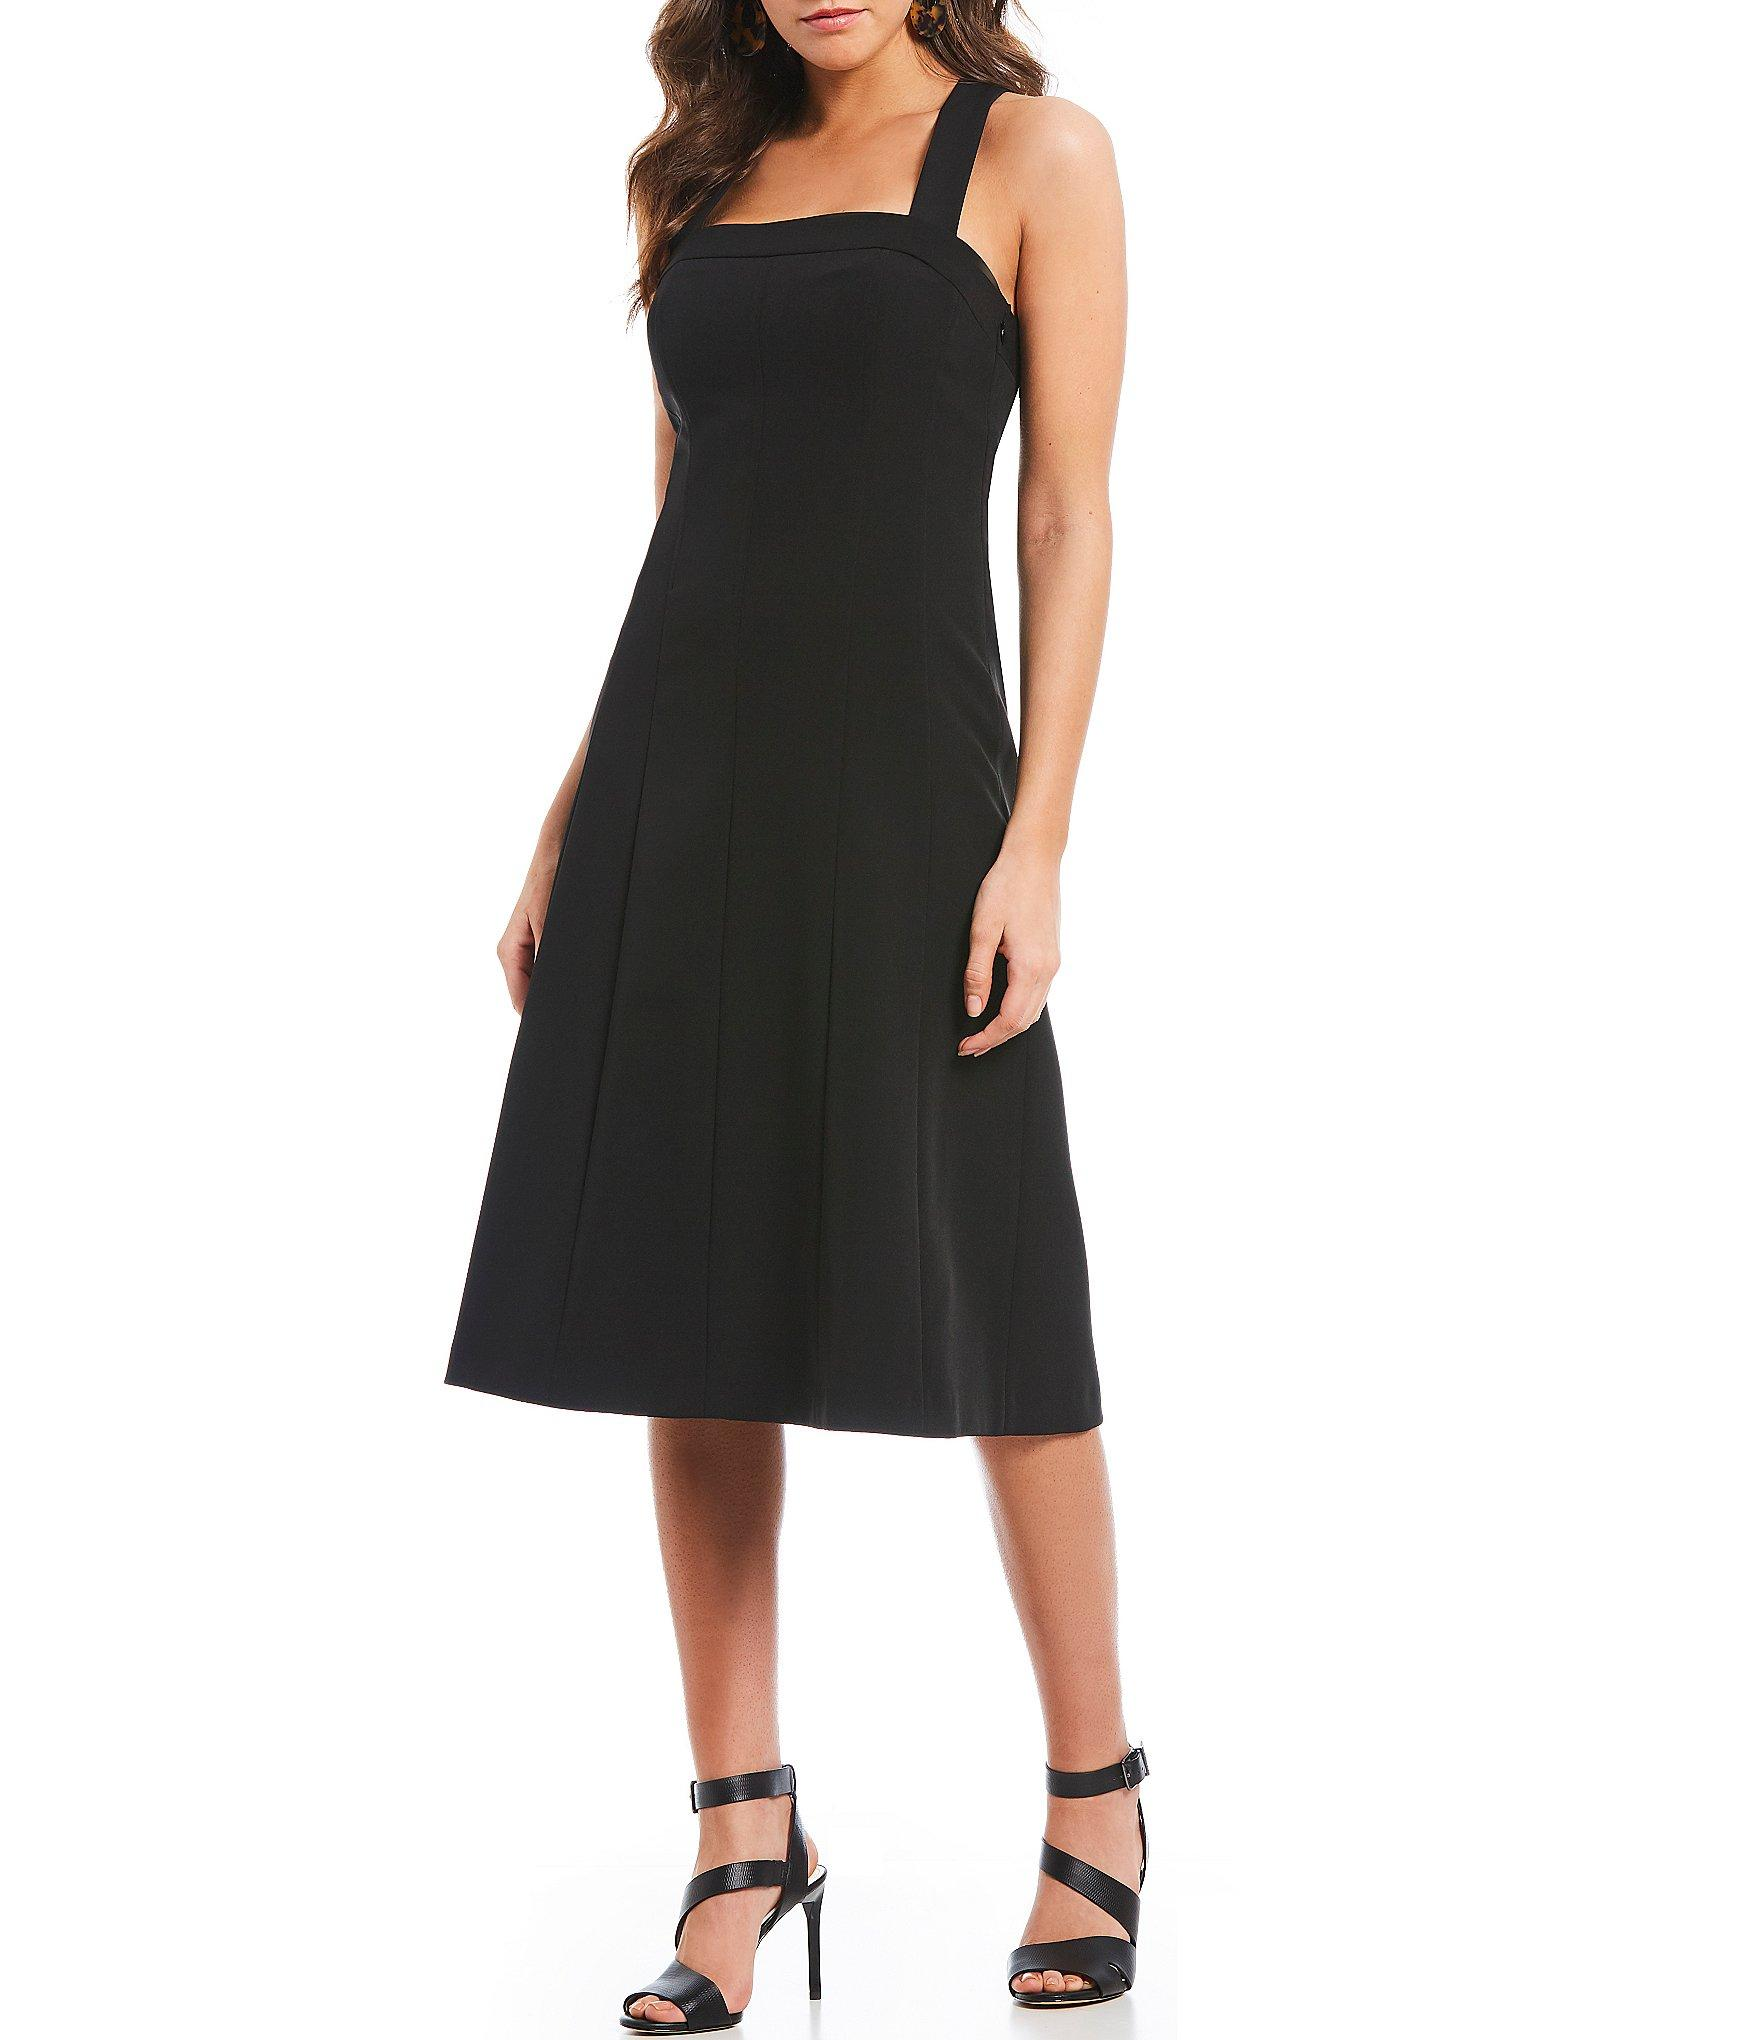 e944c3b1101 Gianni Bini - Black Gia Sleeveless Square Neckline Midi Dress - Lyst. View  fullscreen